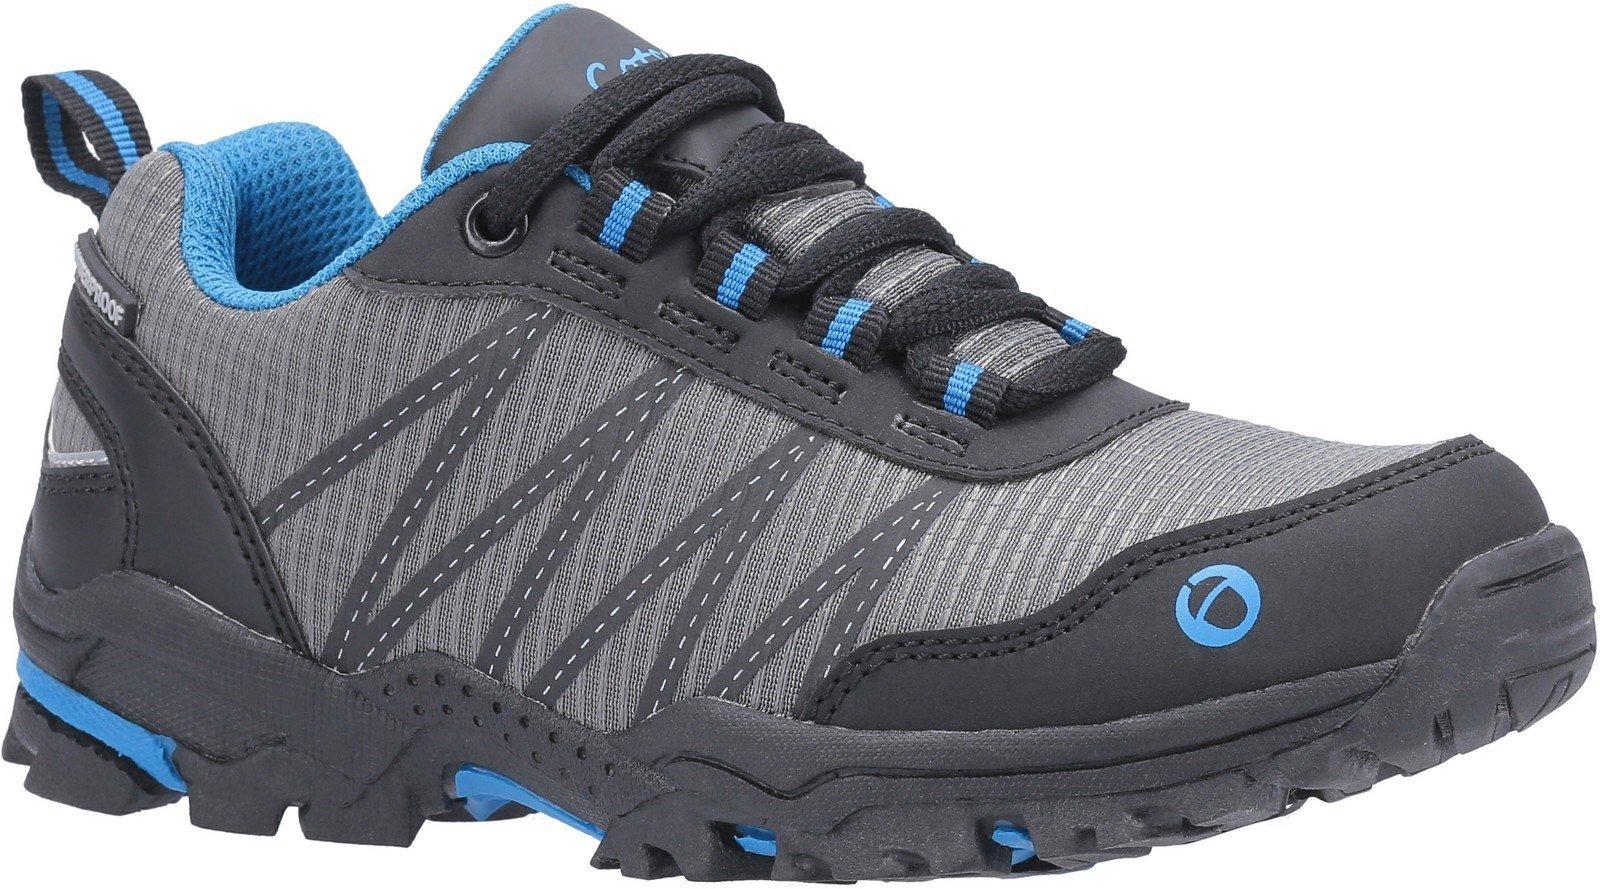 Cotswold Kids Littledean Lace Up Hiking Waterproof Boot Multicolor 30174 - Blue/Grey 10